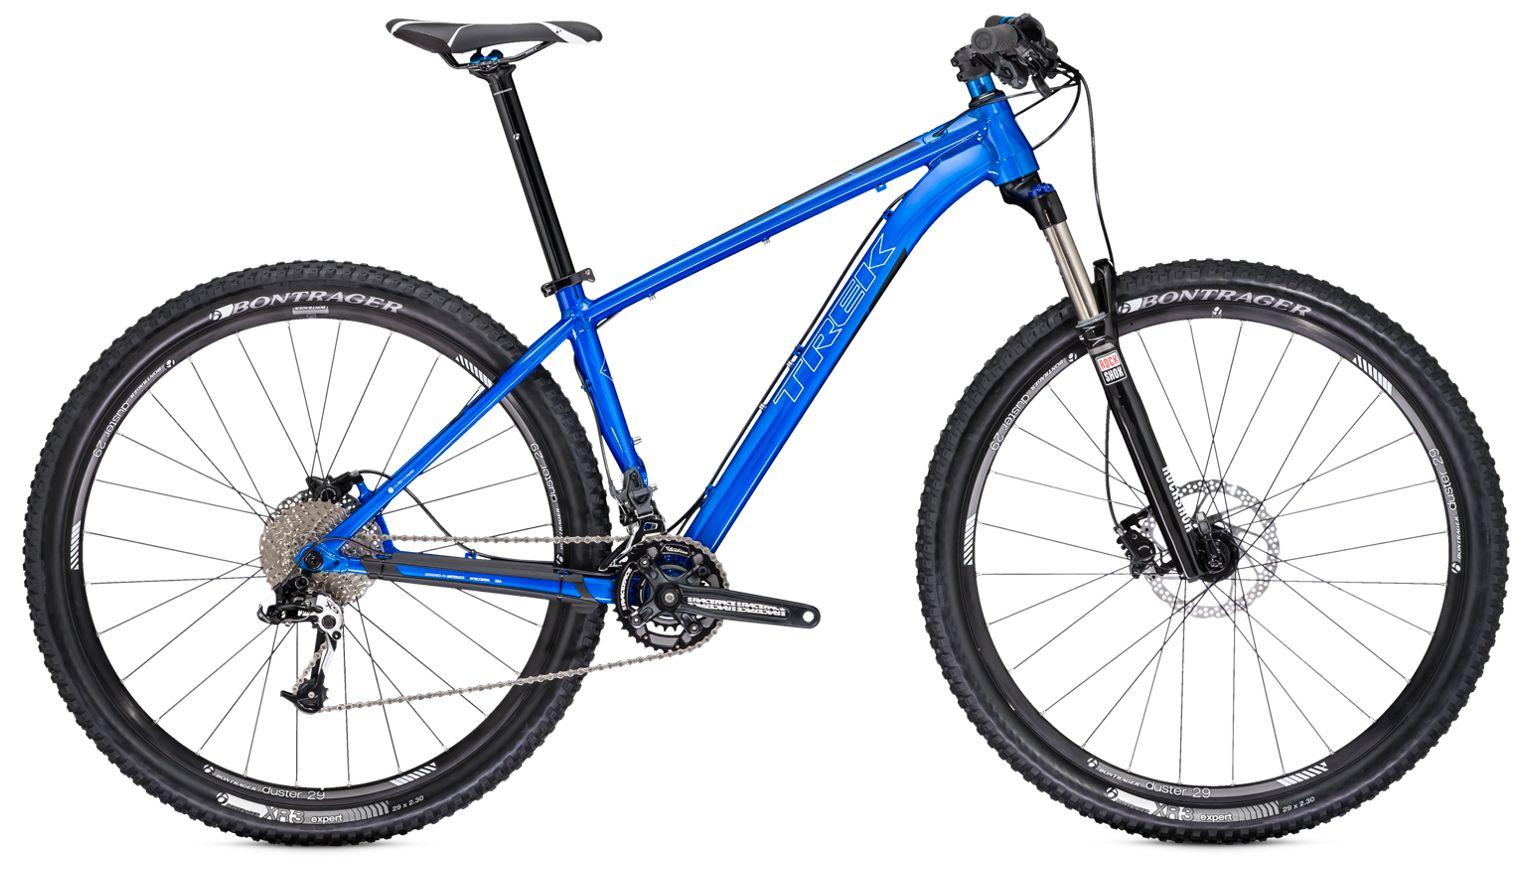 Велосипед Trek Stache 7 2014,  Горные  - артикул:284027